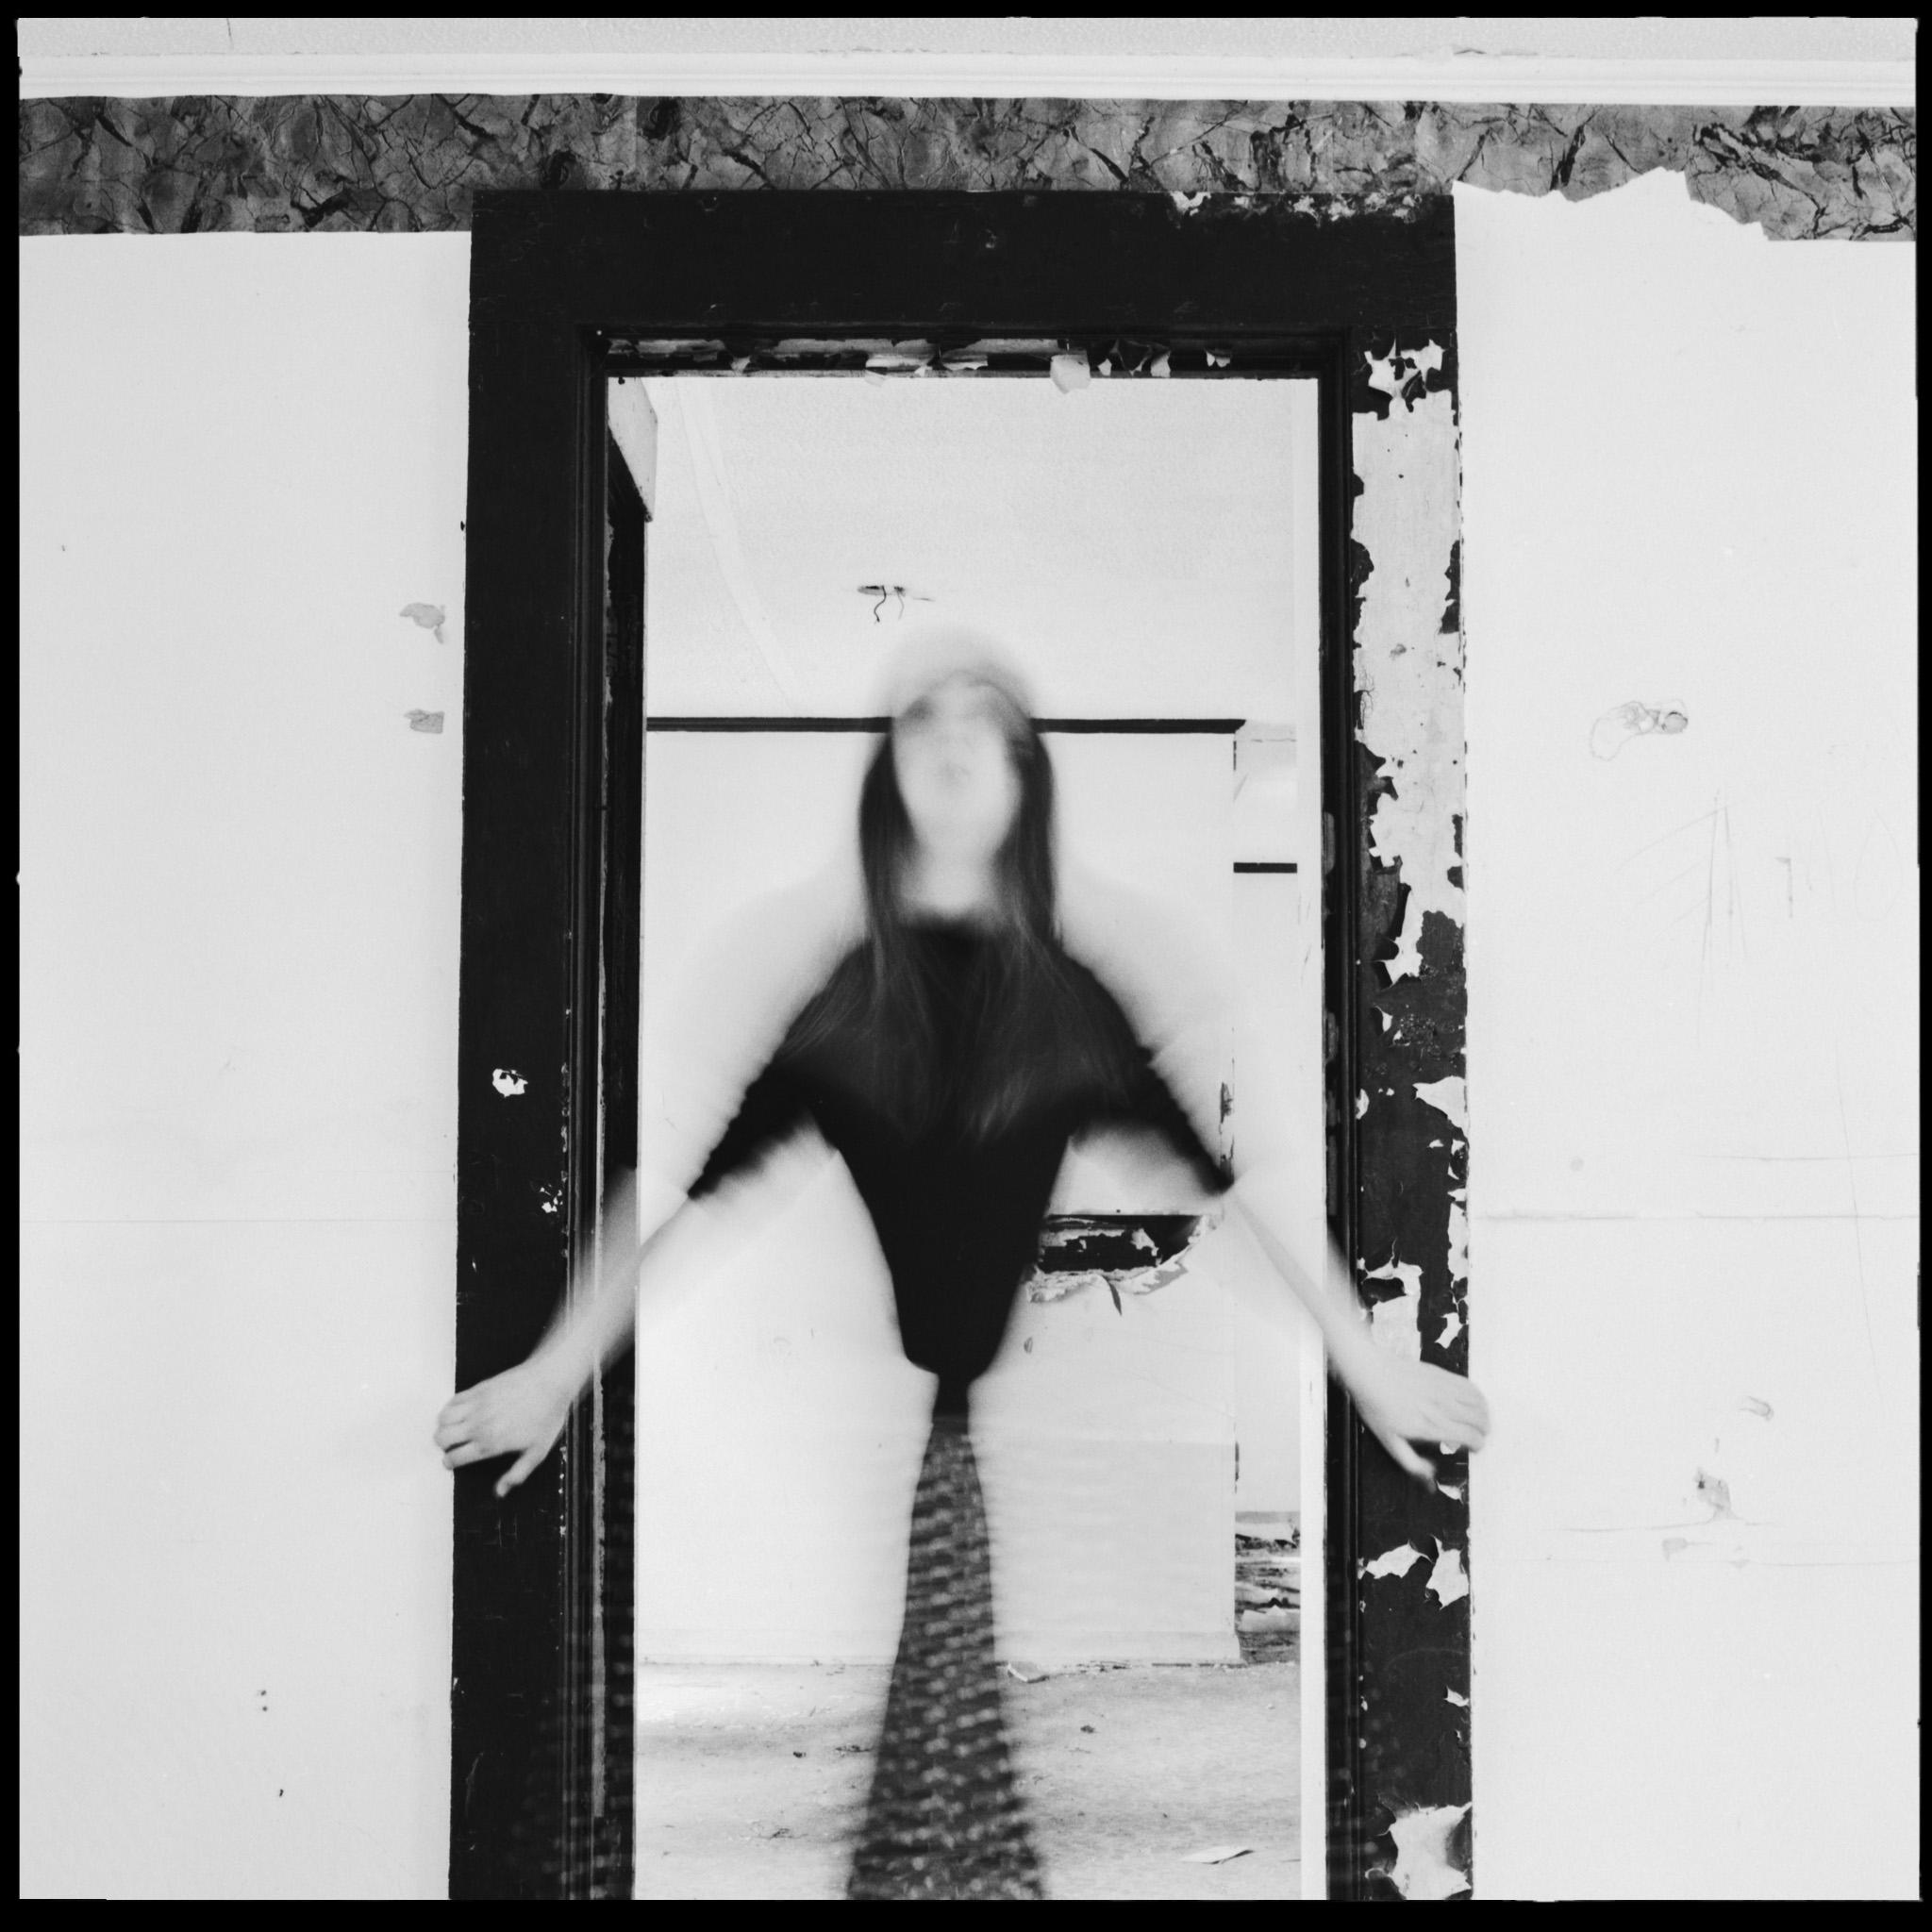 Model:Mackenzie Wolcott  Cameras used: Hasselblad 501CM  Film:Hp5+ 120 medium format